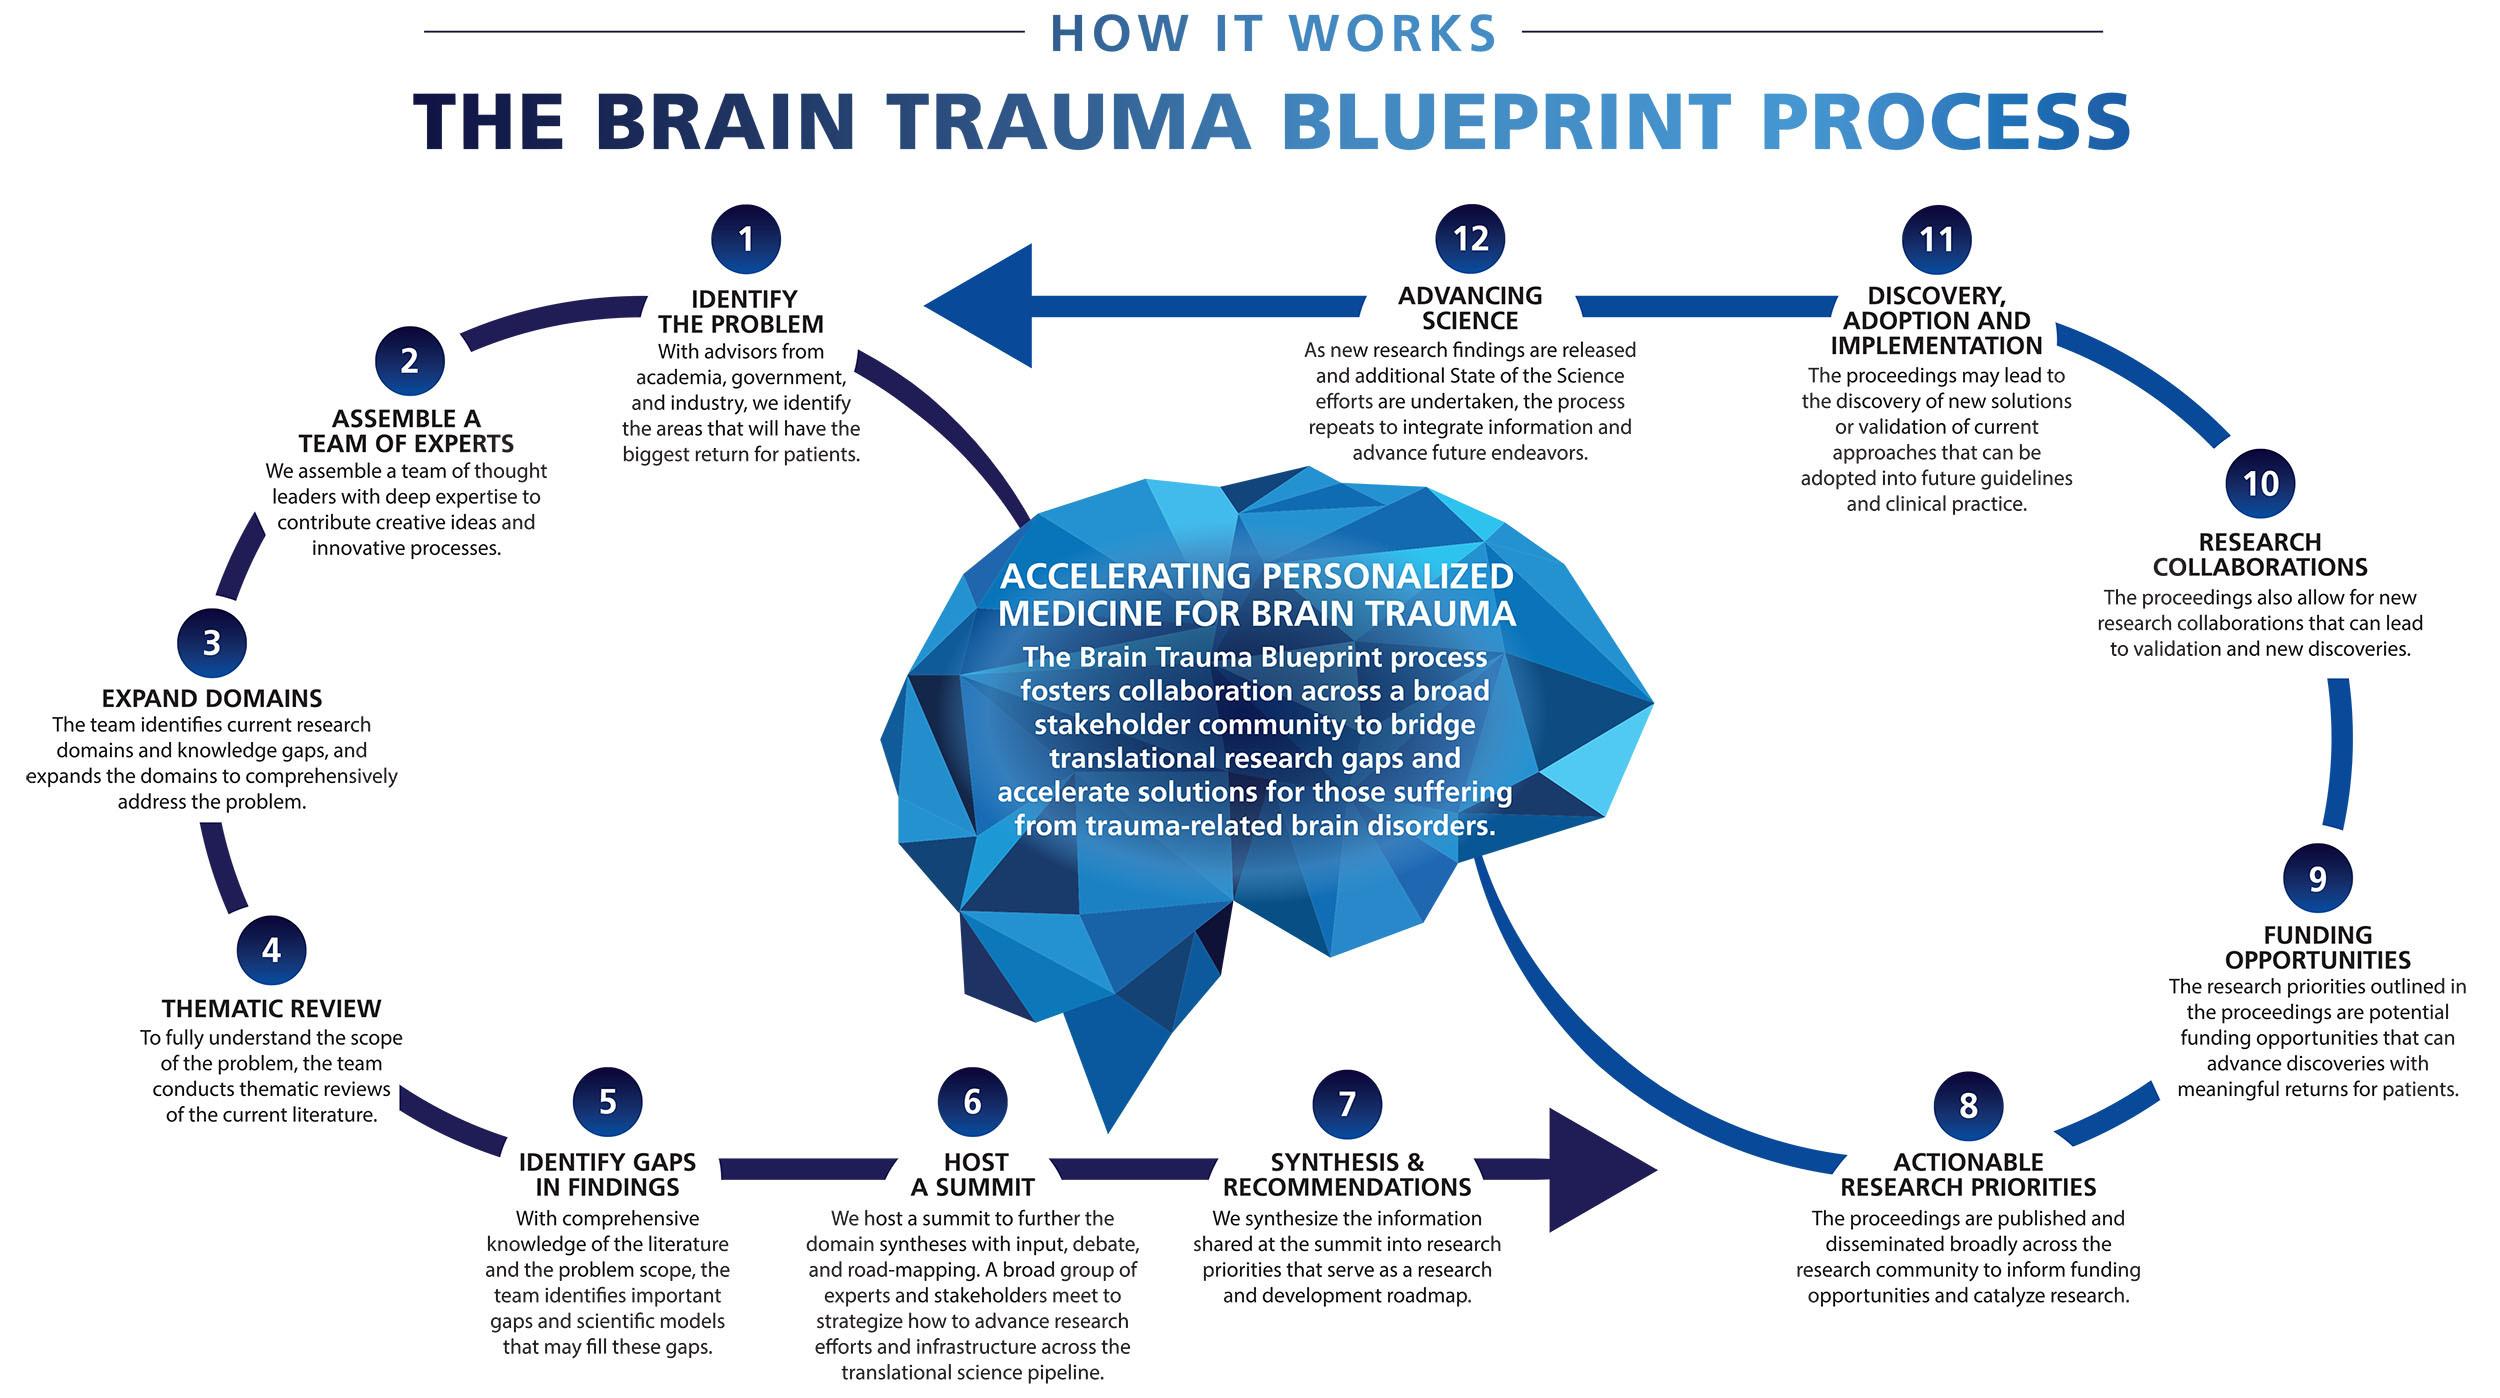 The Brain Trauma Blueprint Process